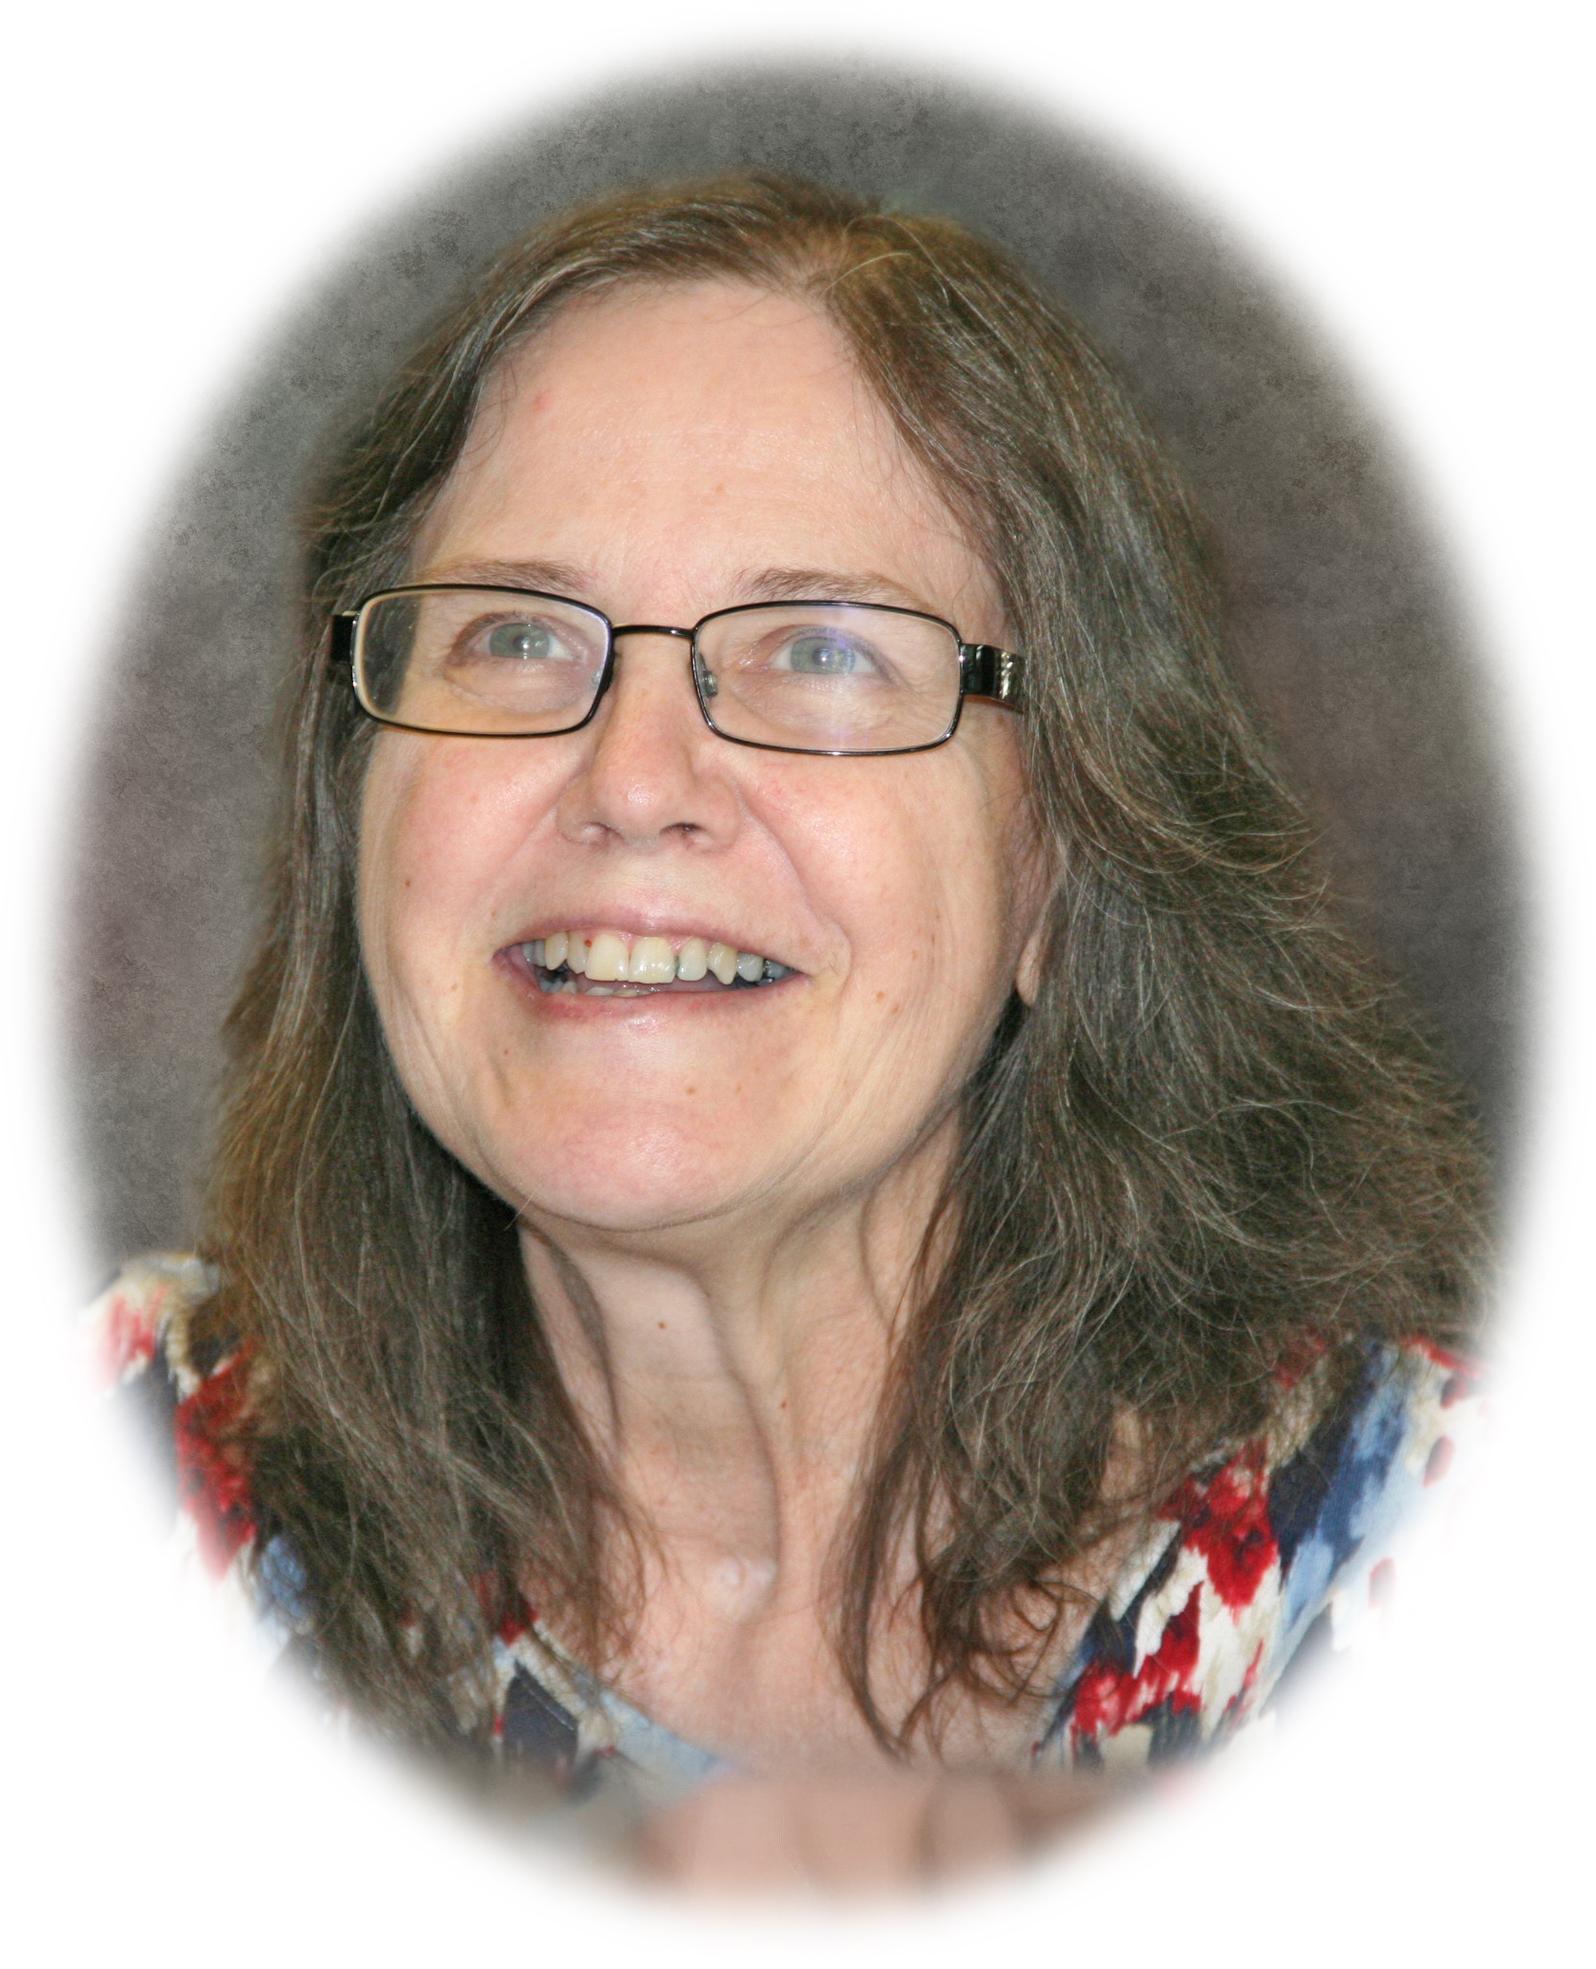 Rebecca S. Morrissey